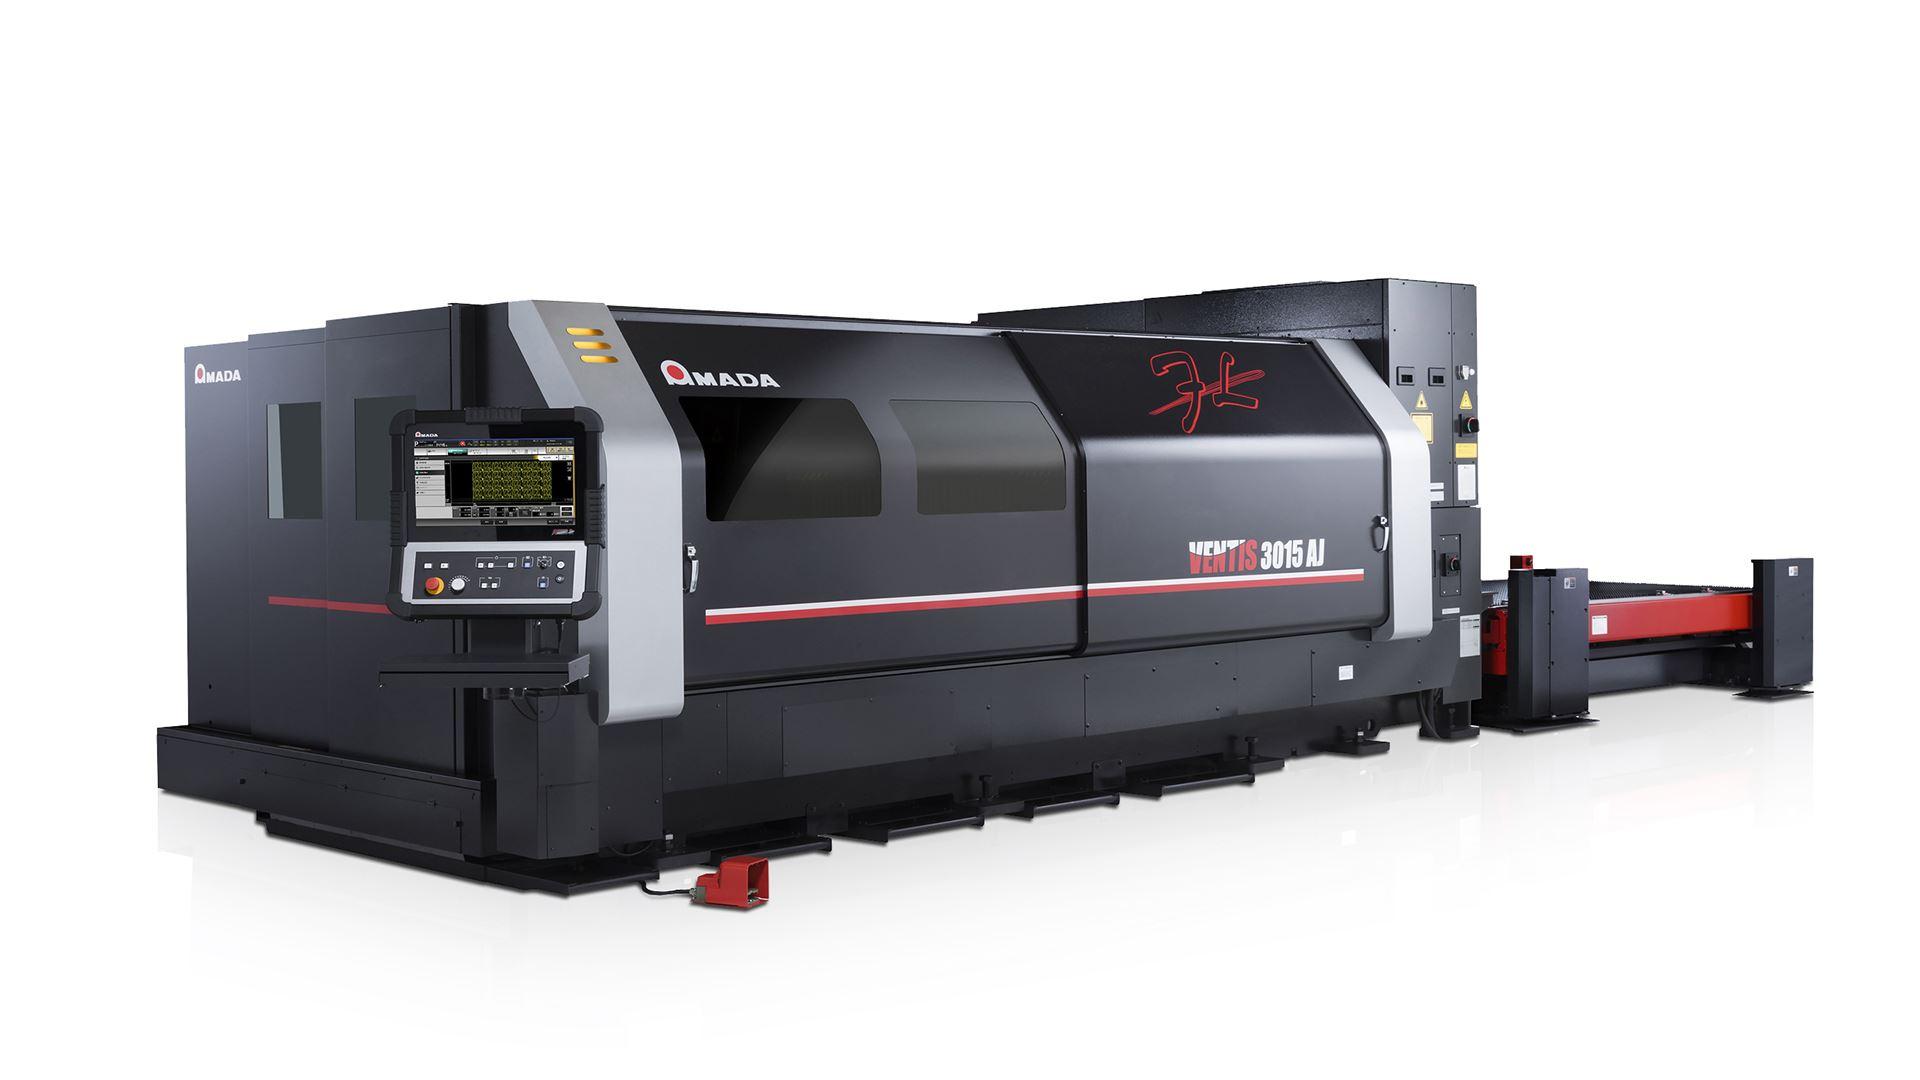 VENTIS-3015AJ 4kW mit NEUEM Lagersystem ASF II-3015